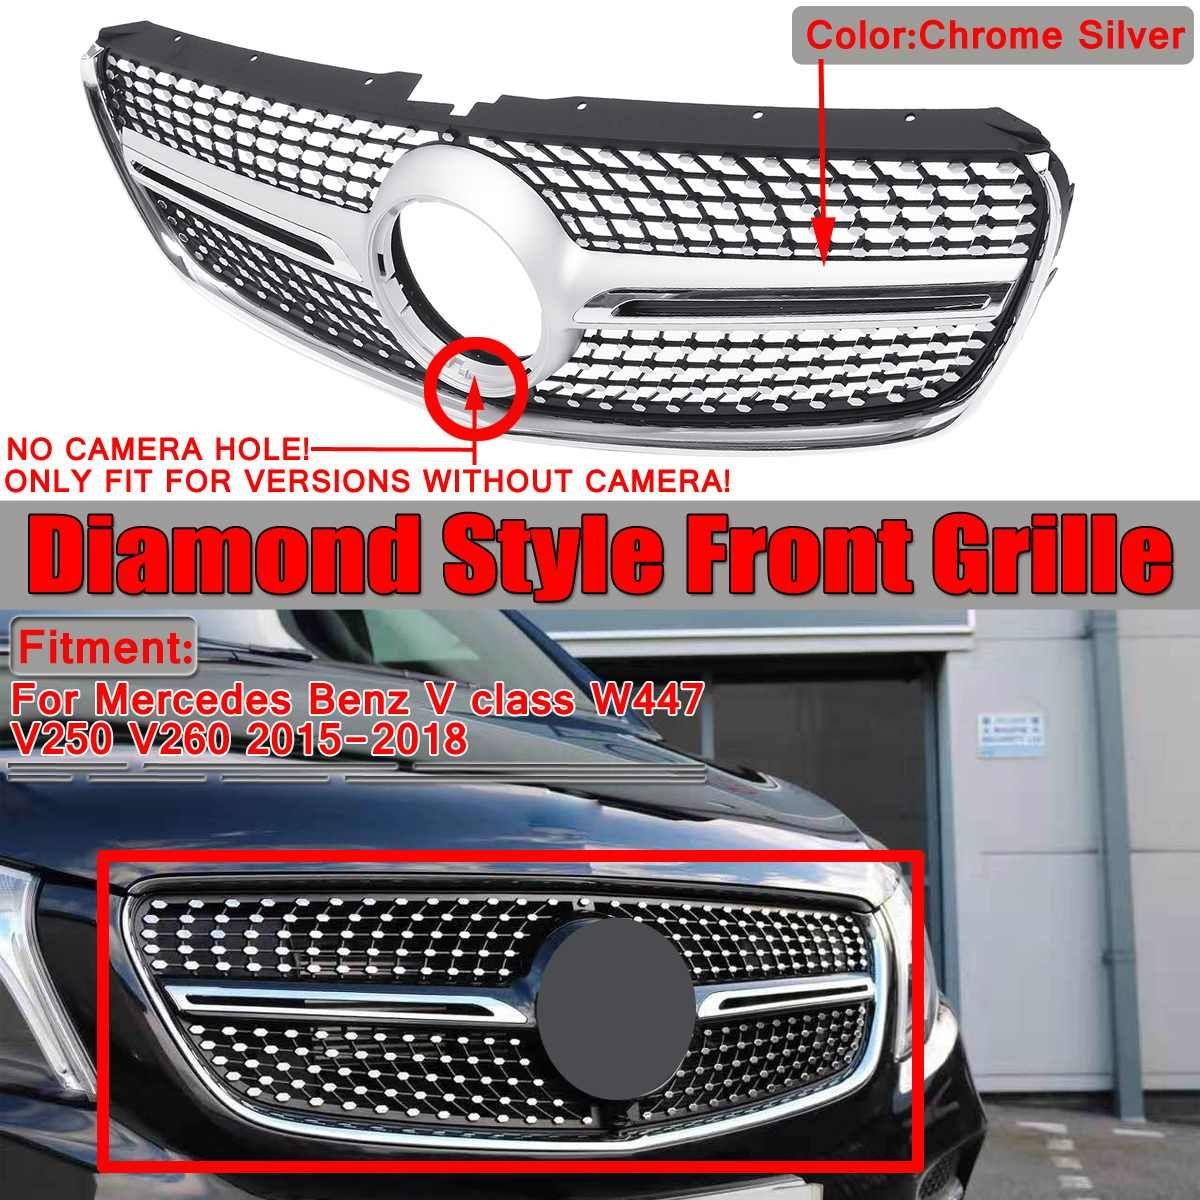 W447 V250 V260 Diamant Auto Frontgrill Grill Für Mercedes Für Benz V Klasse W447 V250 V260 2015 2016 2017 2018 kein Emblem